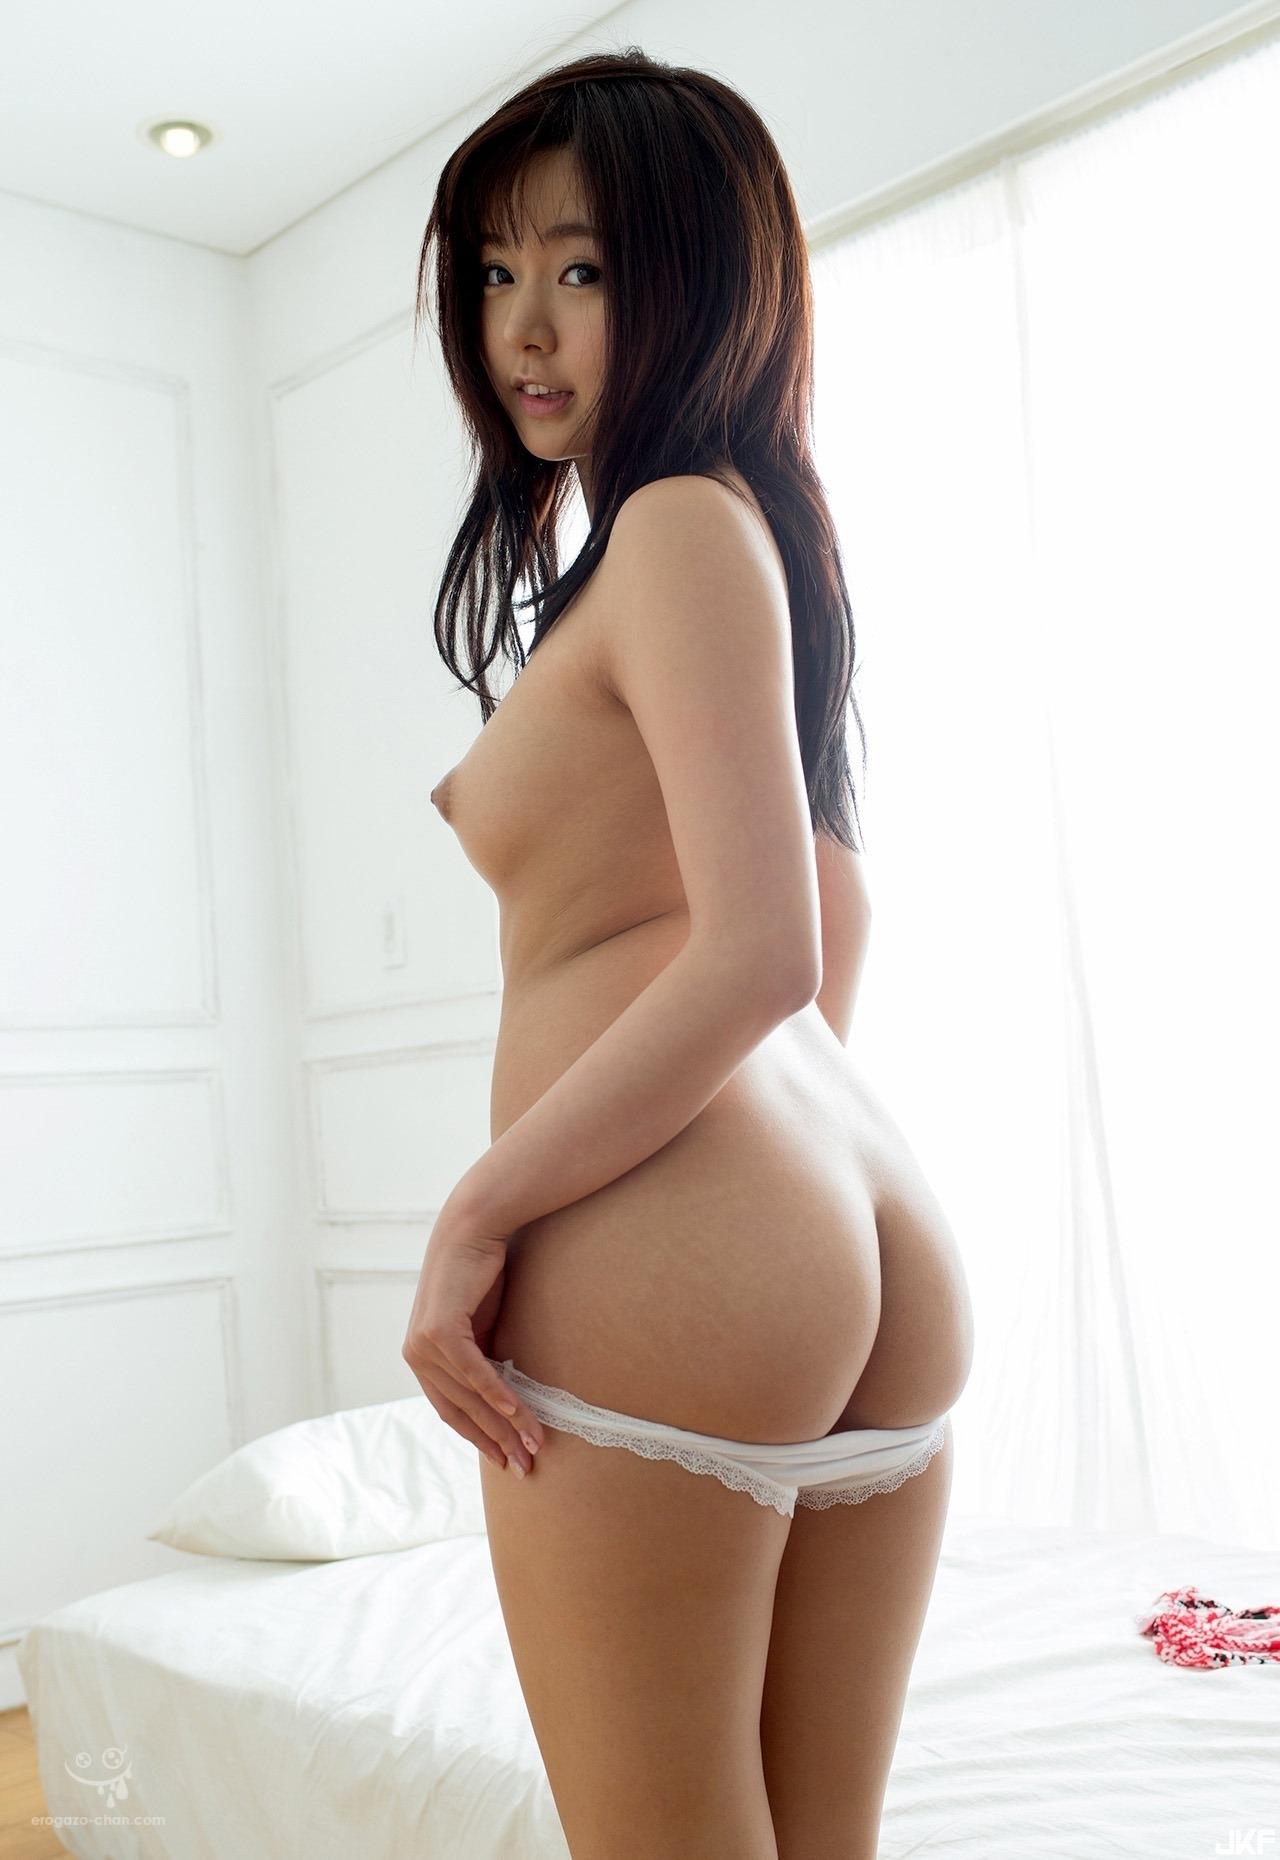 ayano_nana_1050-026.jpg